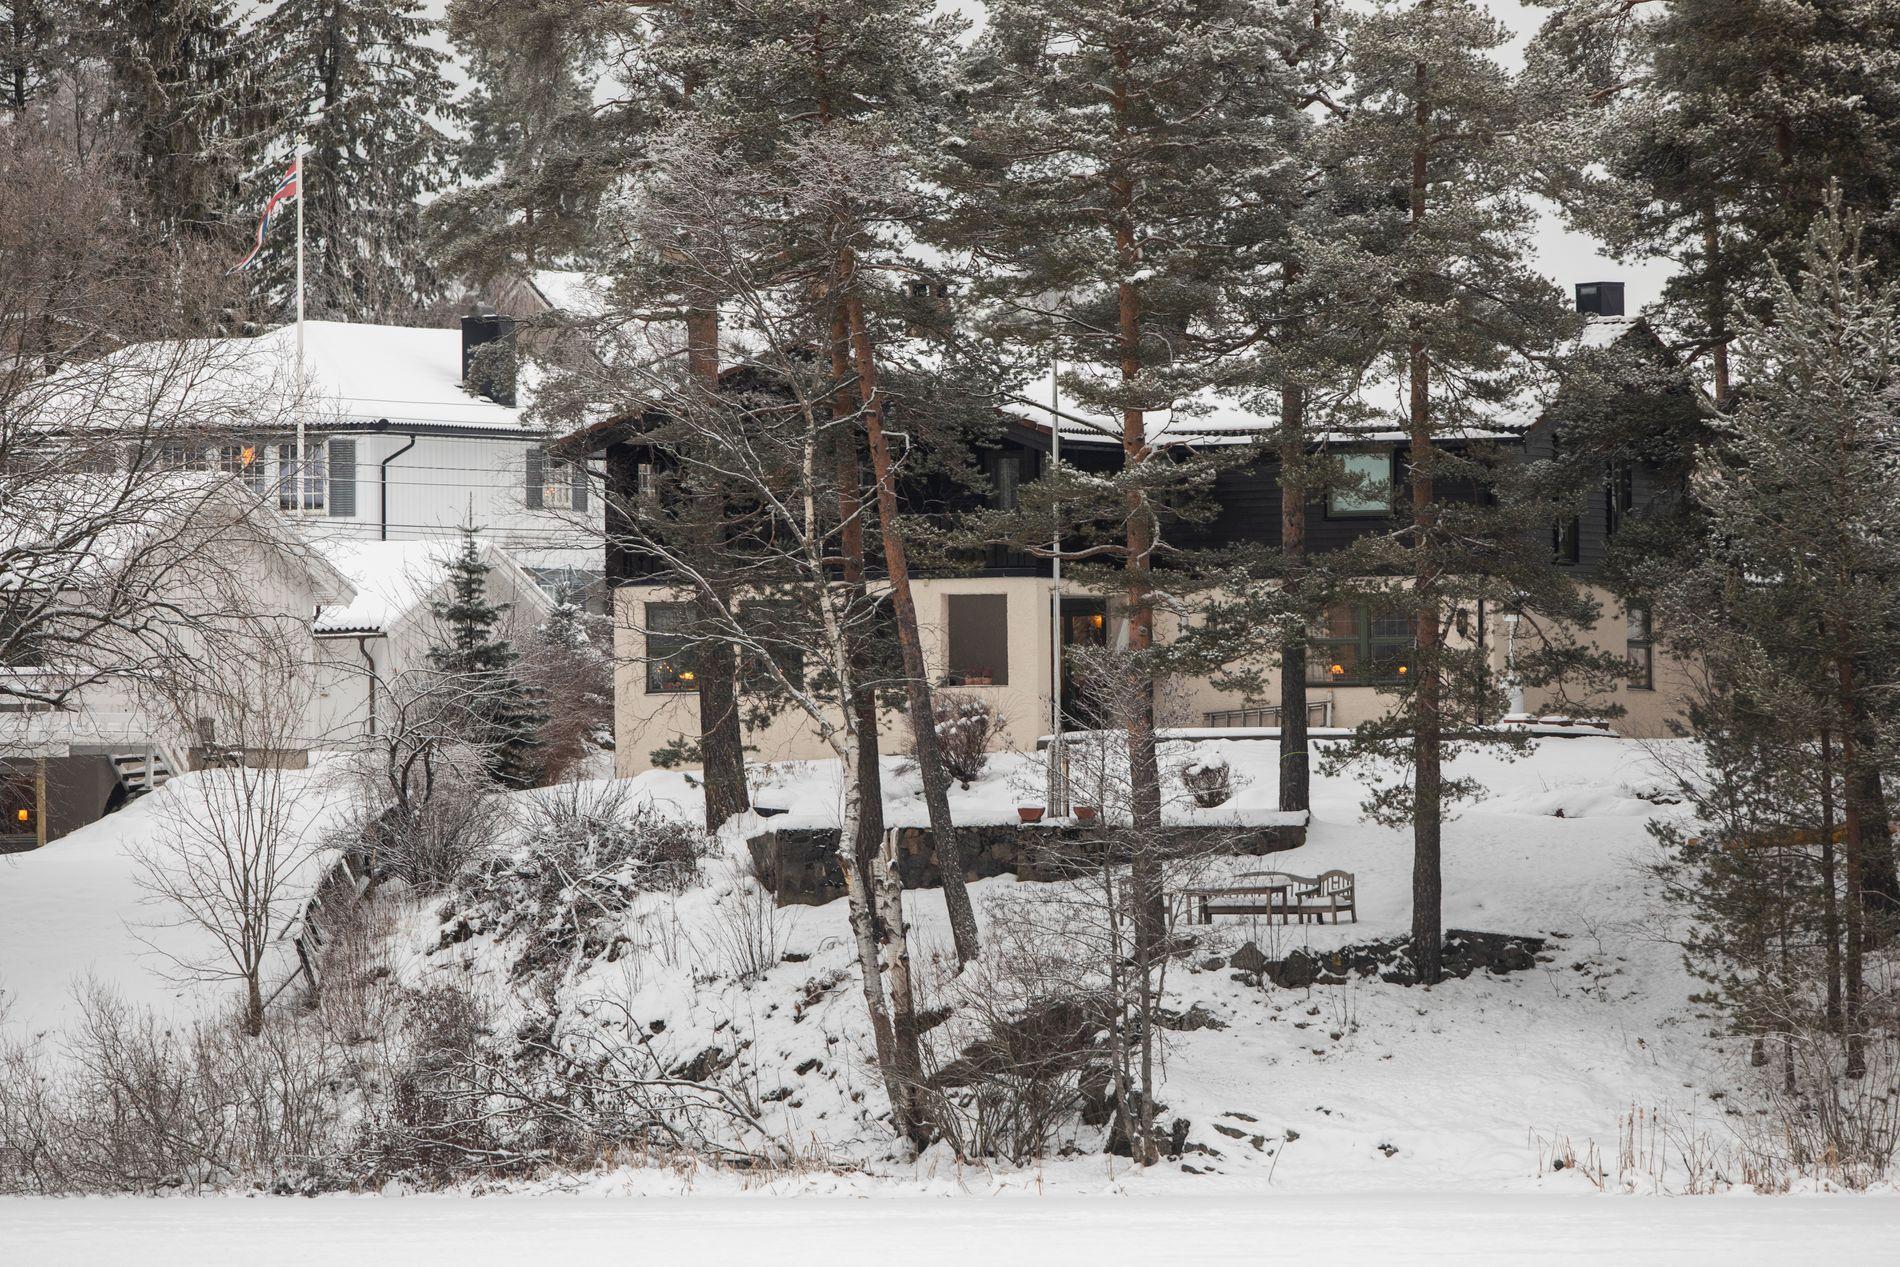 FORSVANT: Anne-Elisabeth Falkevik Hagen (68) forsvant fra sitt eget hjem på Fjellhamar i Lørenskog 31. oktober i fjor.